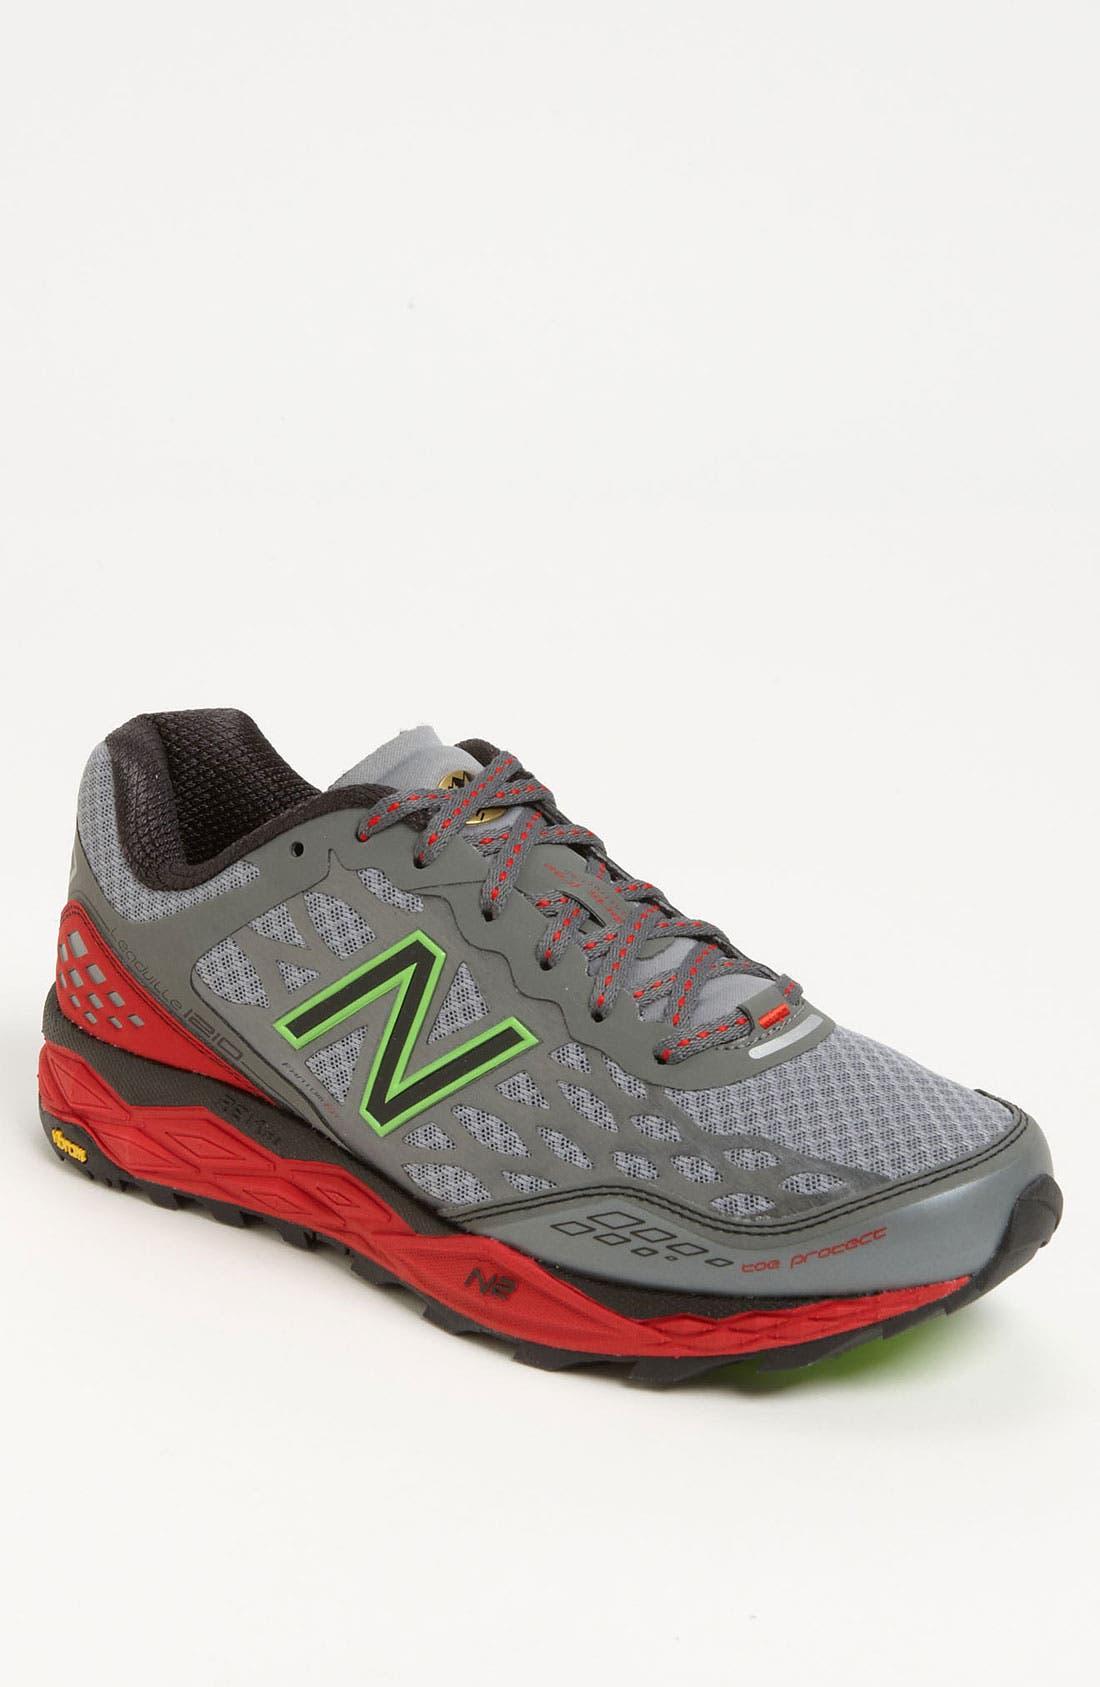 Alternate Image 1 Selected - New Balance '1210' Trail Running Shoe (Men)